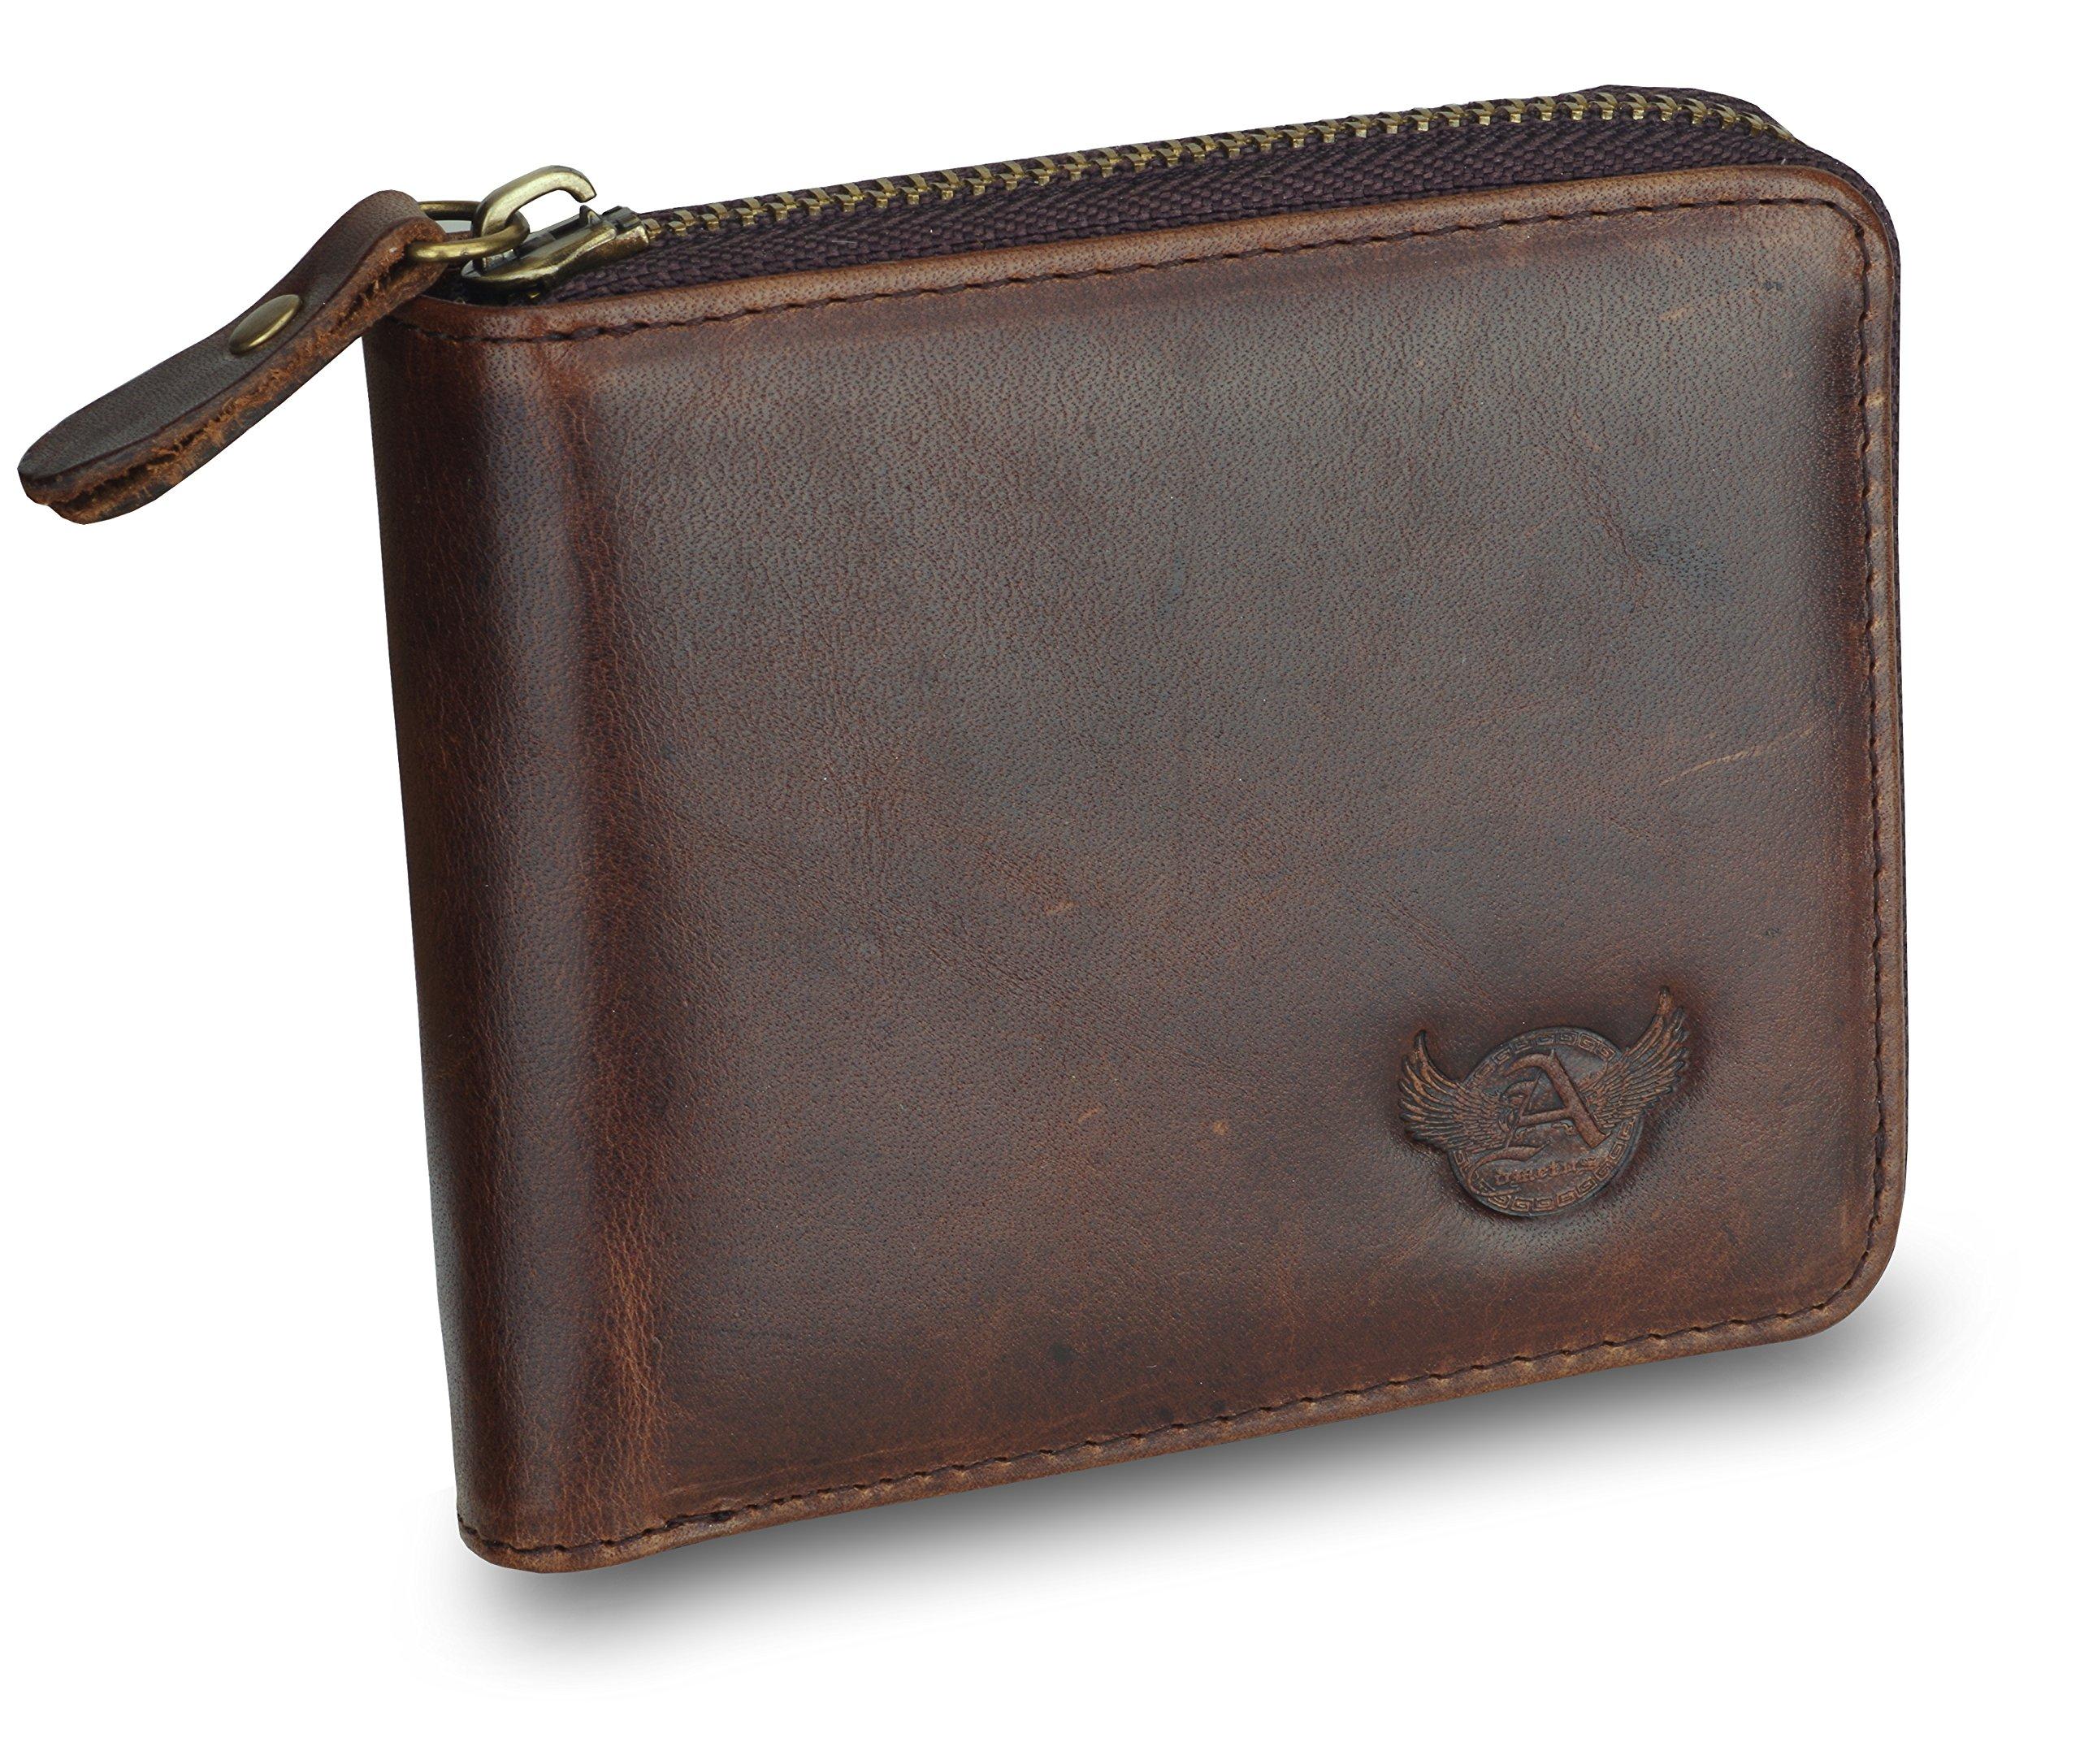 Men's Genuine Leather Short Zip-around Bifold Wallet Exquisite box Christmas Gift Admetus